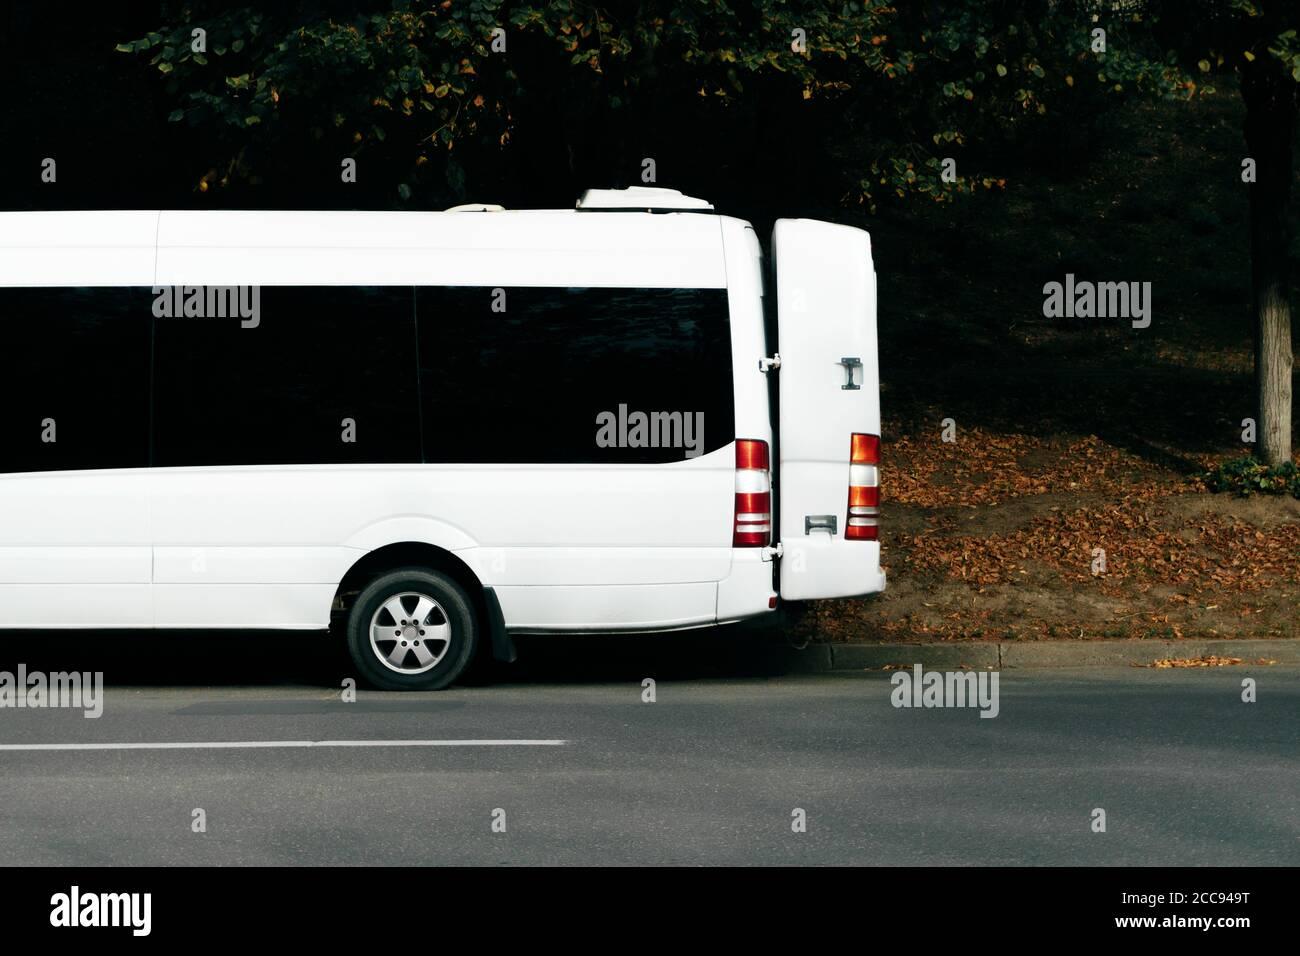 Foto de parte de microbús, concepto de transporte urbano, auto escolar. Foto de stock